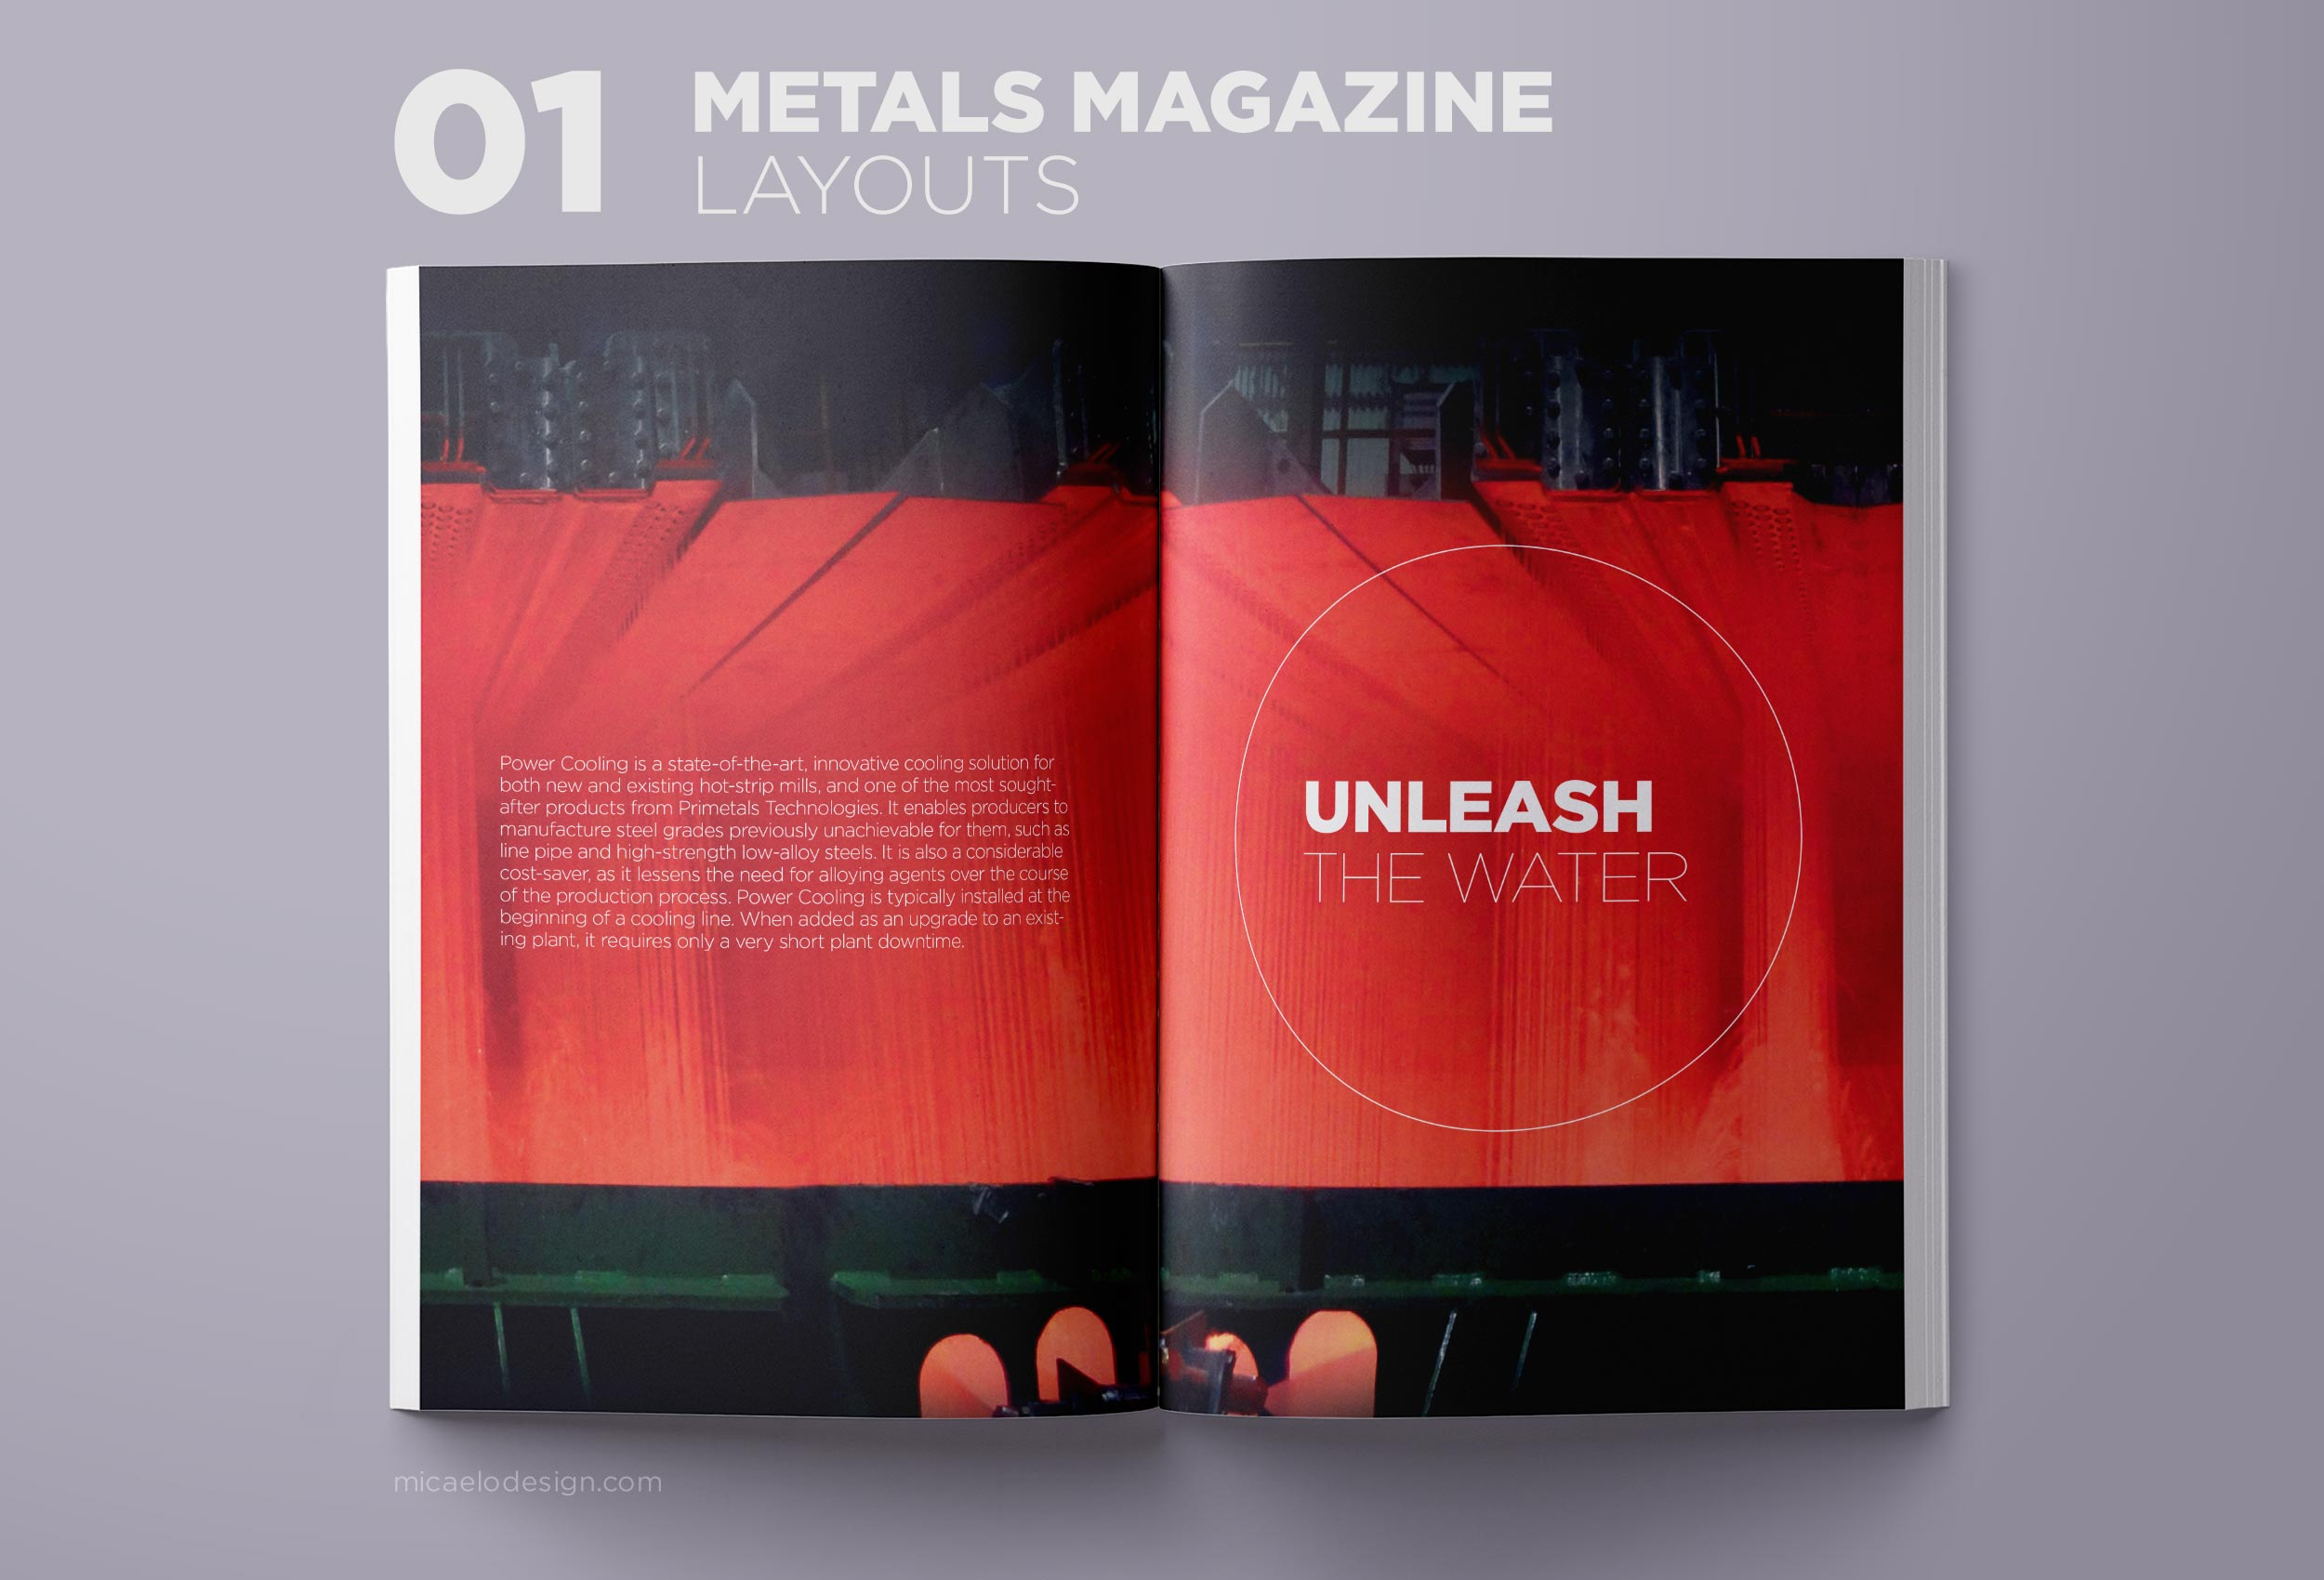 Primetals Metals Magazine layout N01